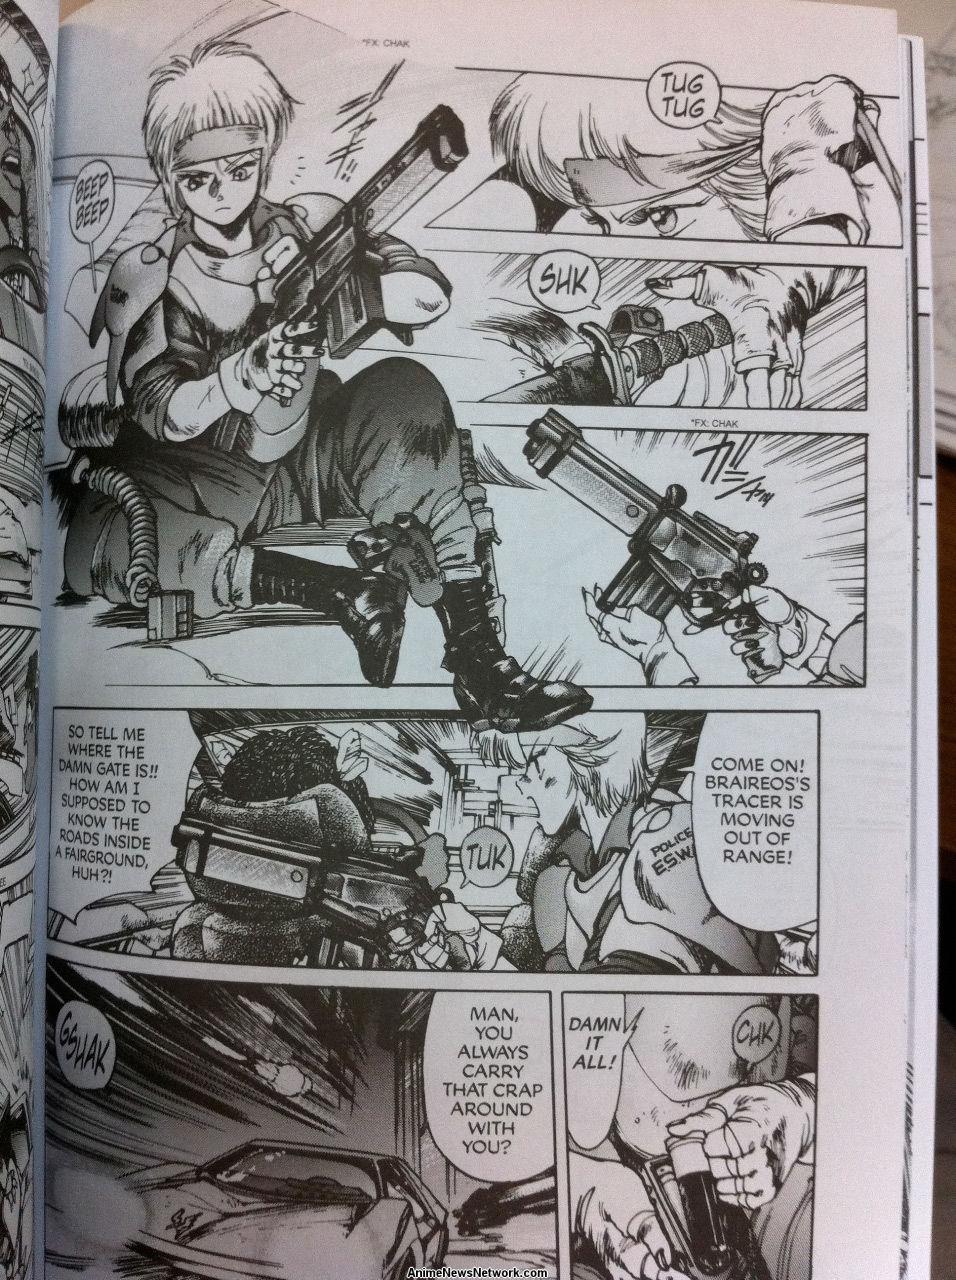 Jason Thompson S House Of 1000 Manga Appleseed Anime News Network